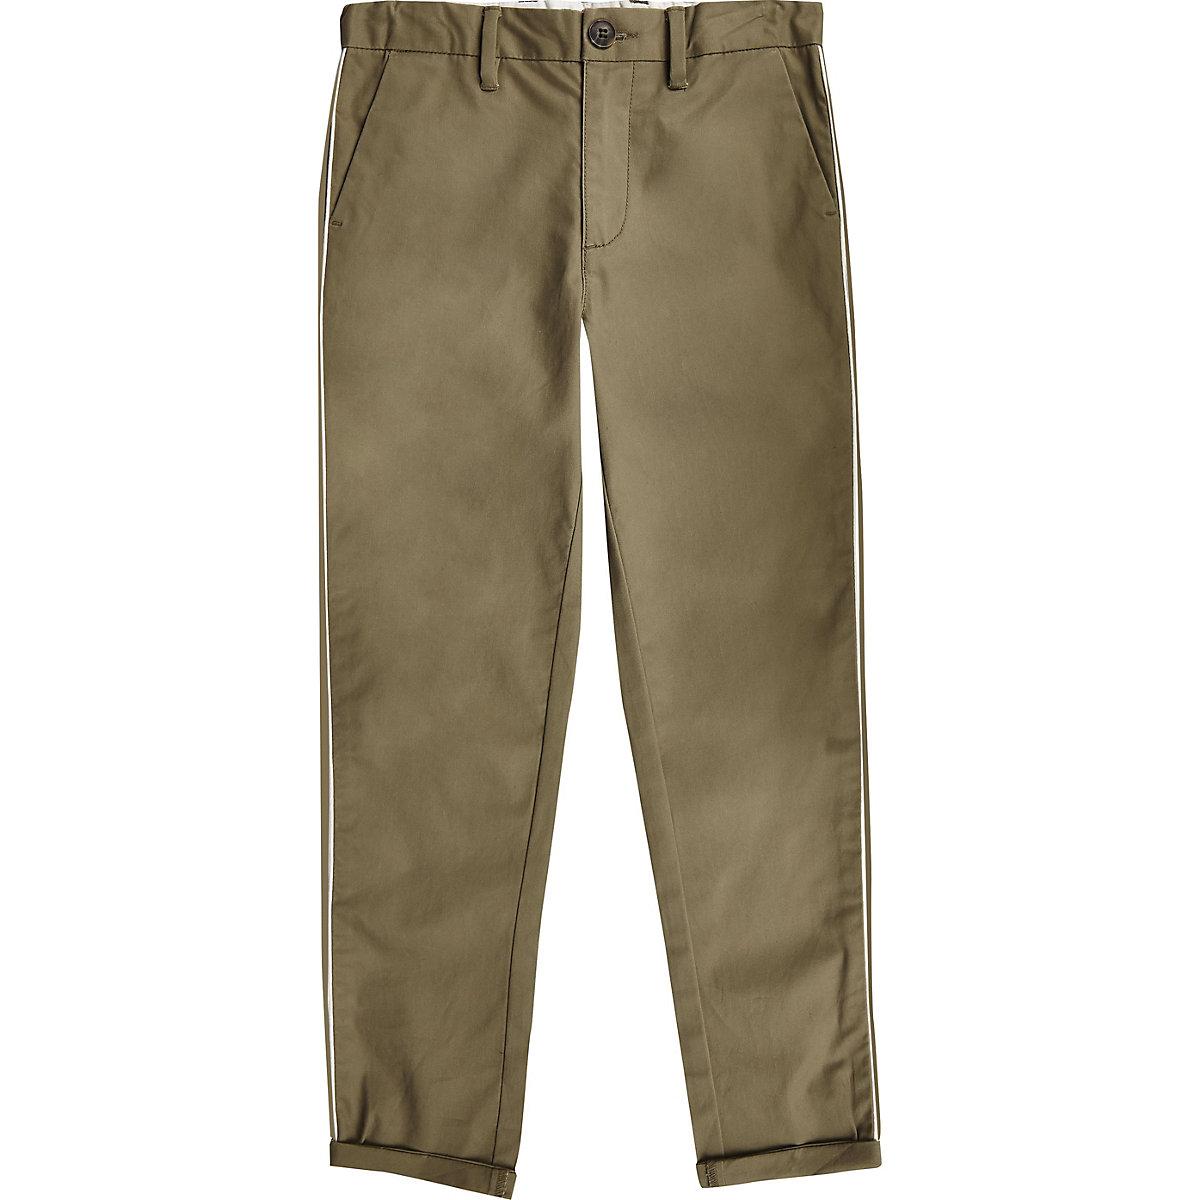 Boys khaki smart pants